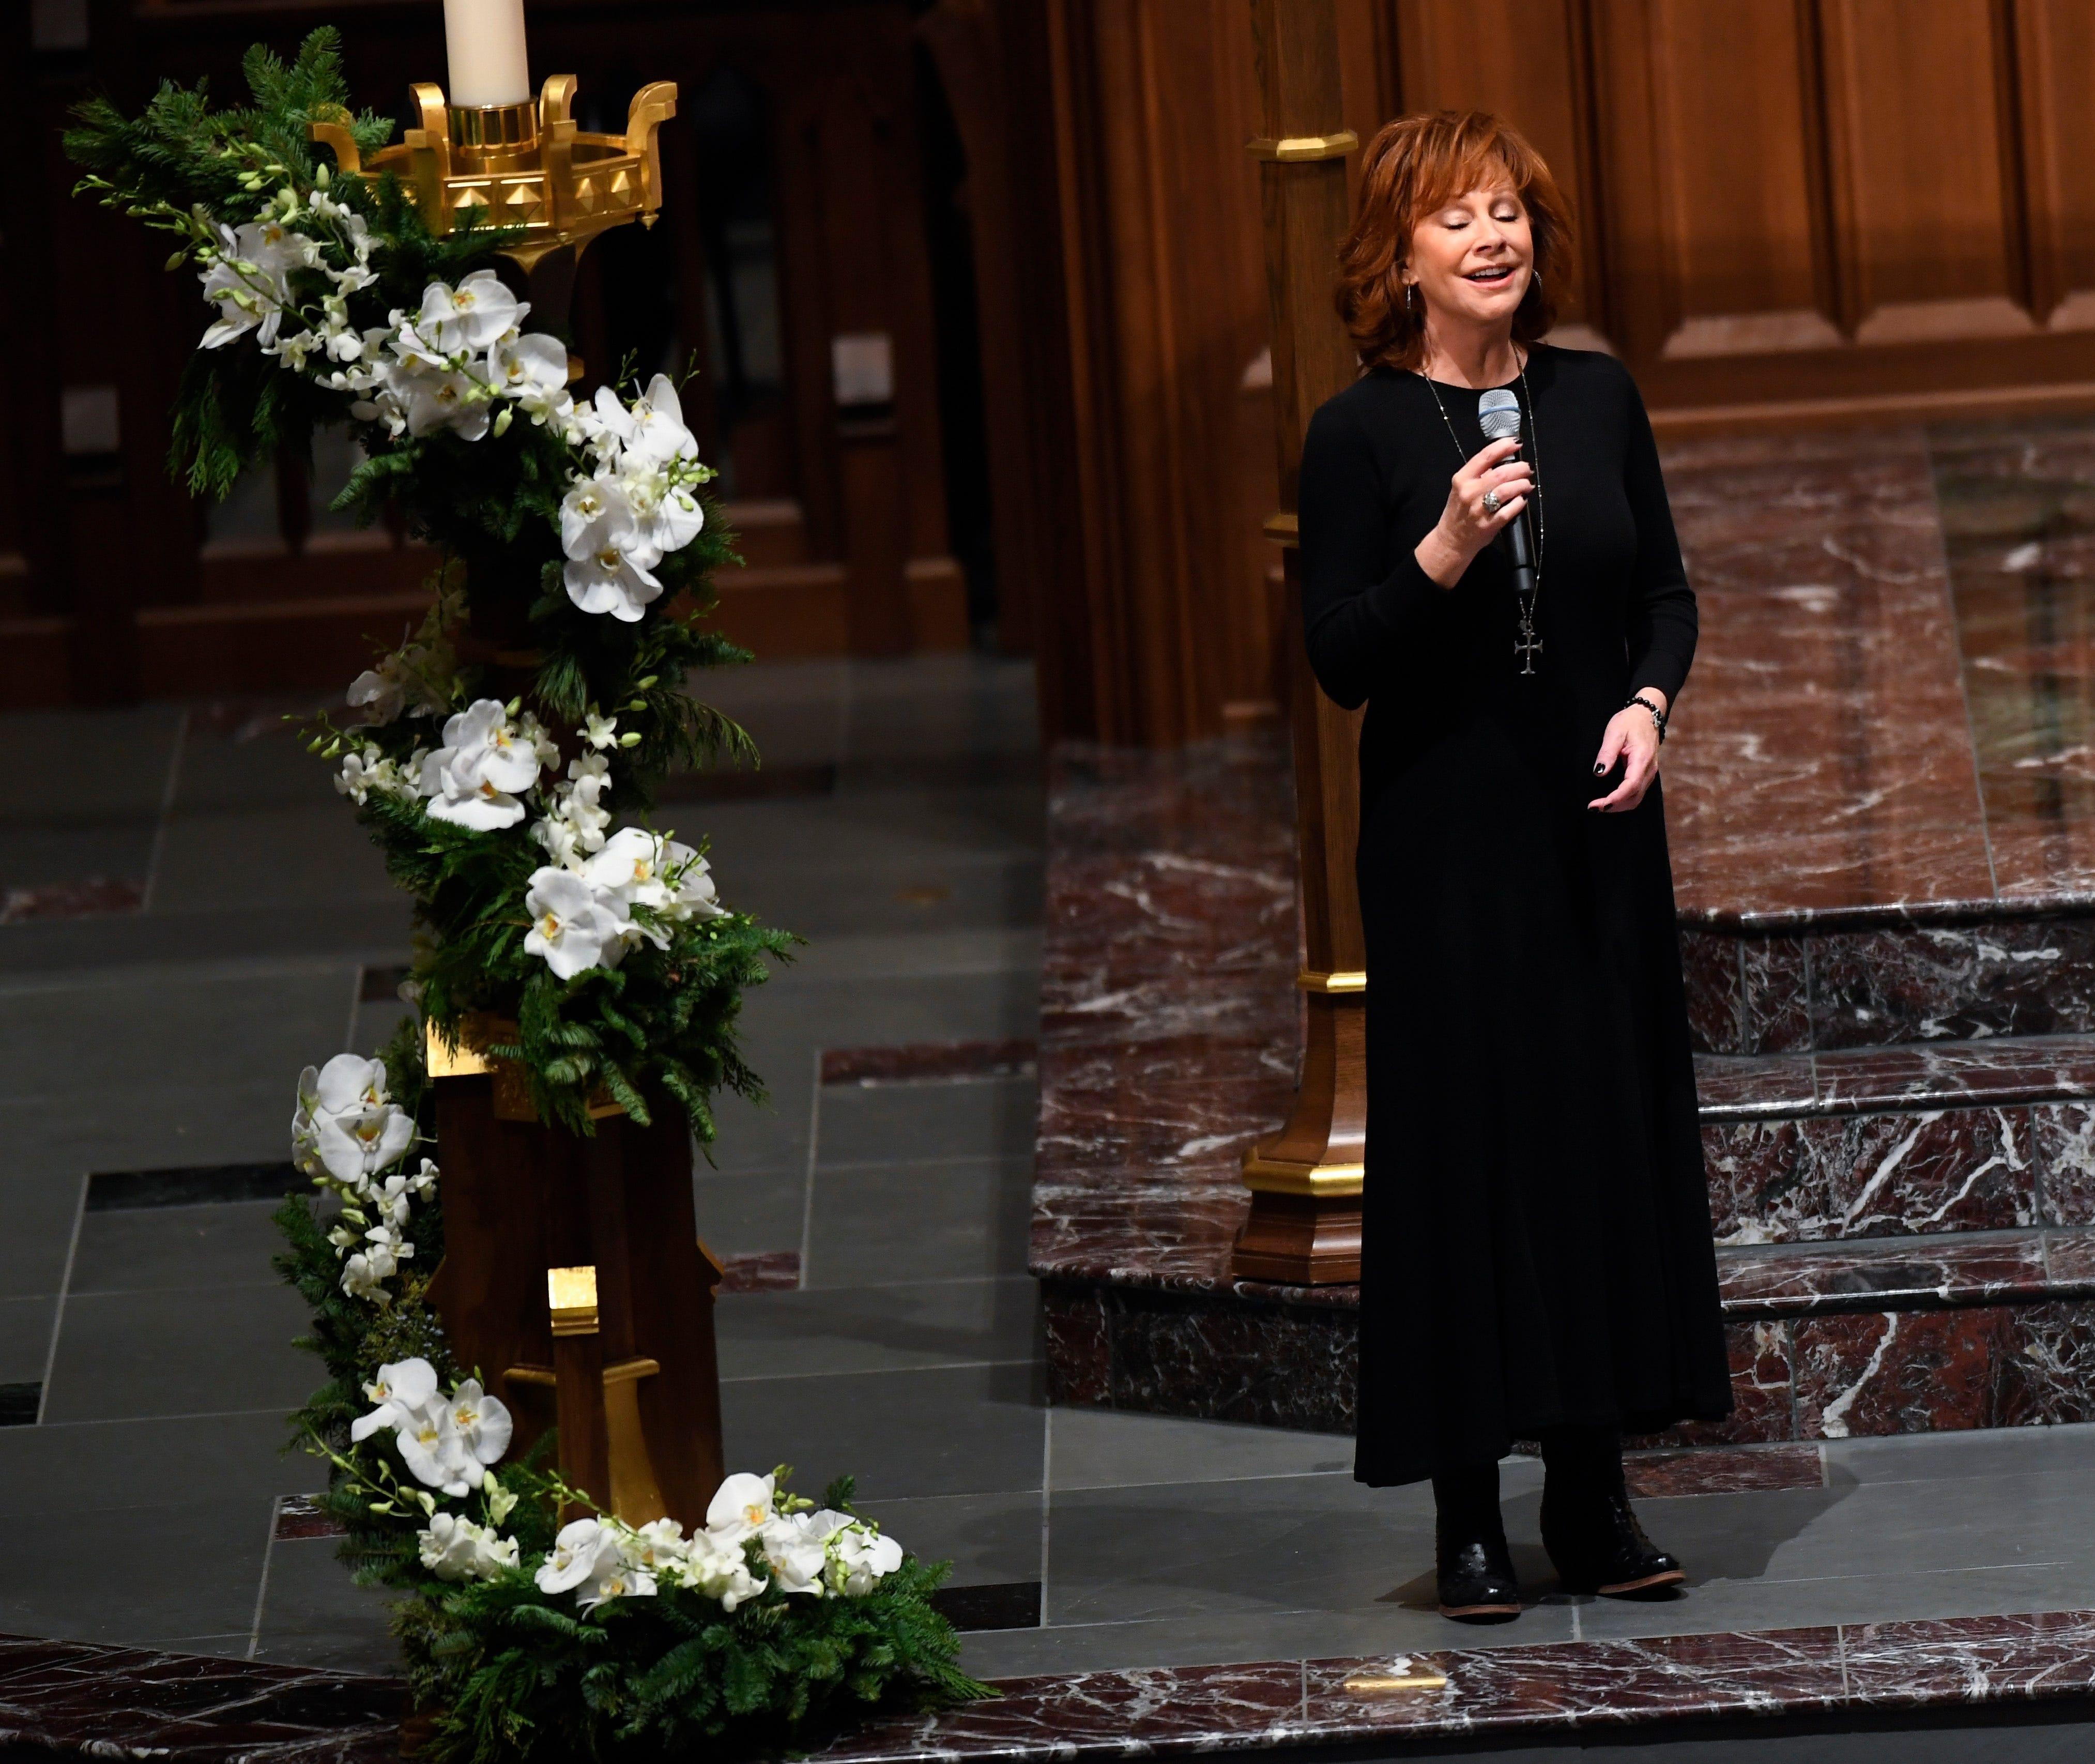 George H.W. Bush funeral: Oak Ridge Boys, Reba McEntire pay tribute with classic songs